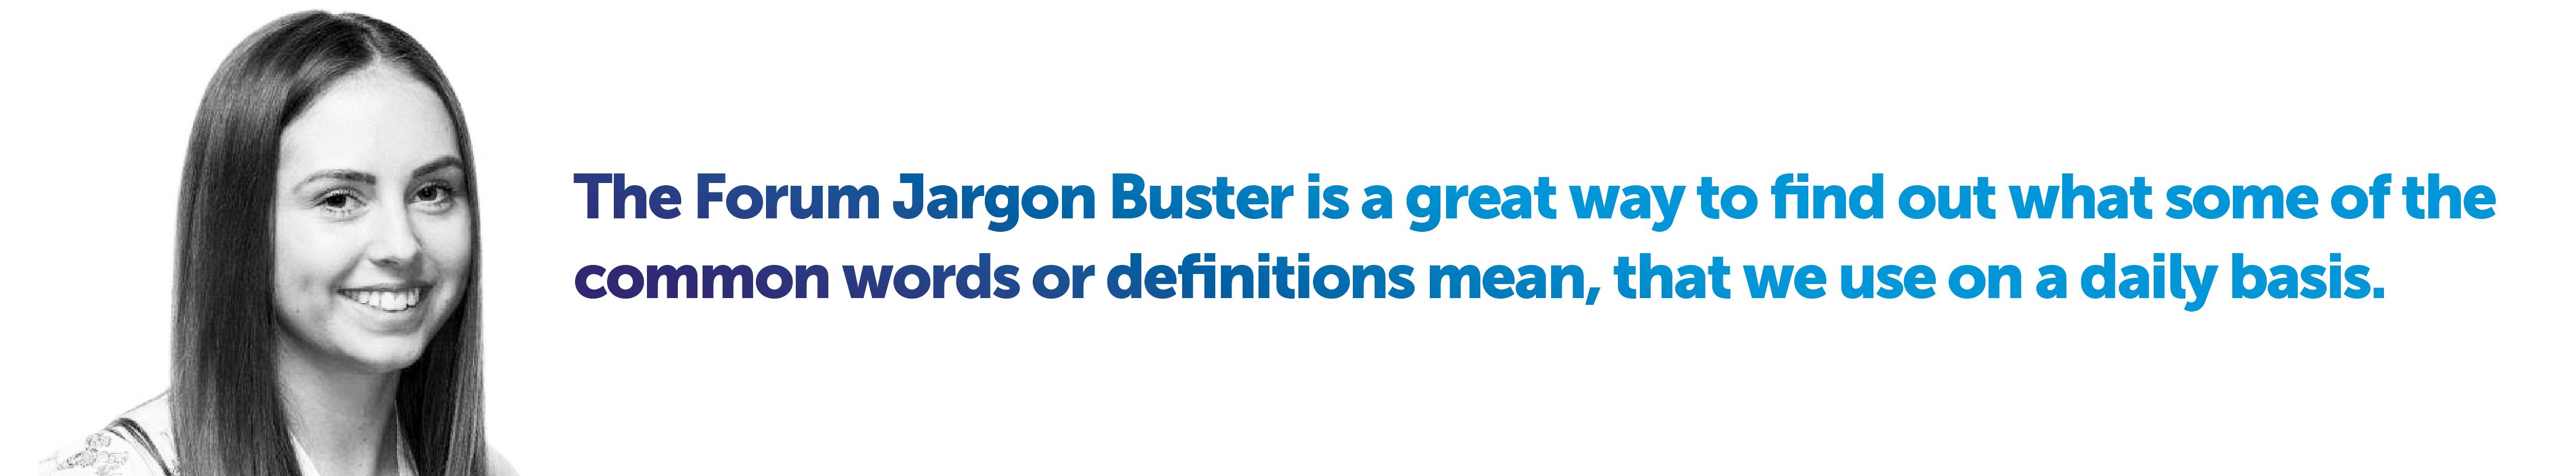 Jargon-buster